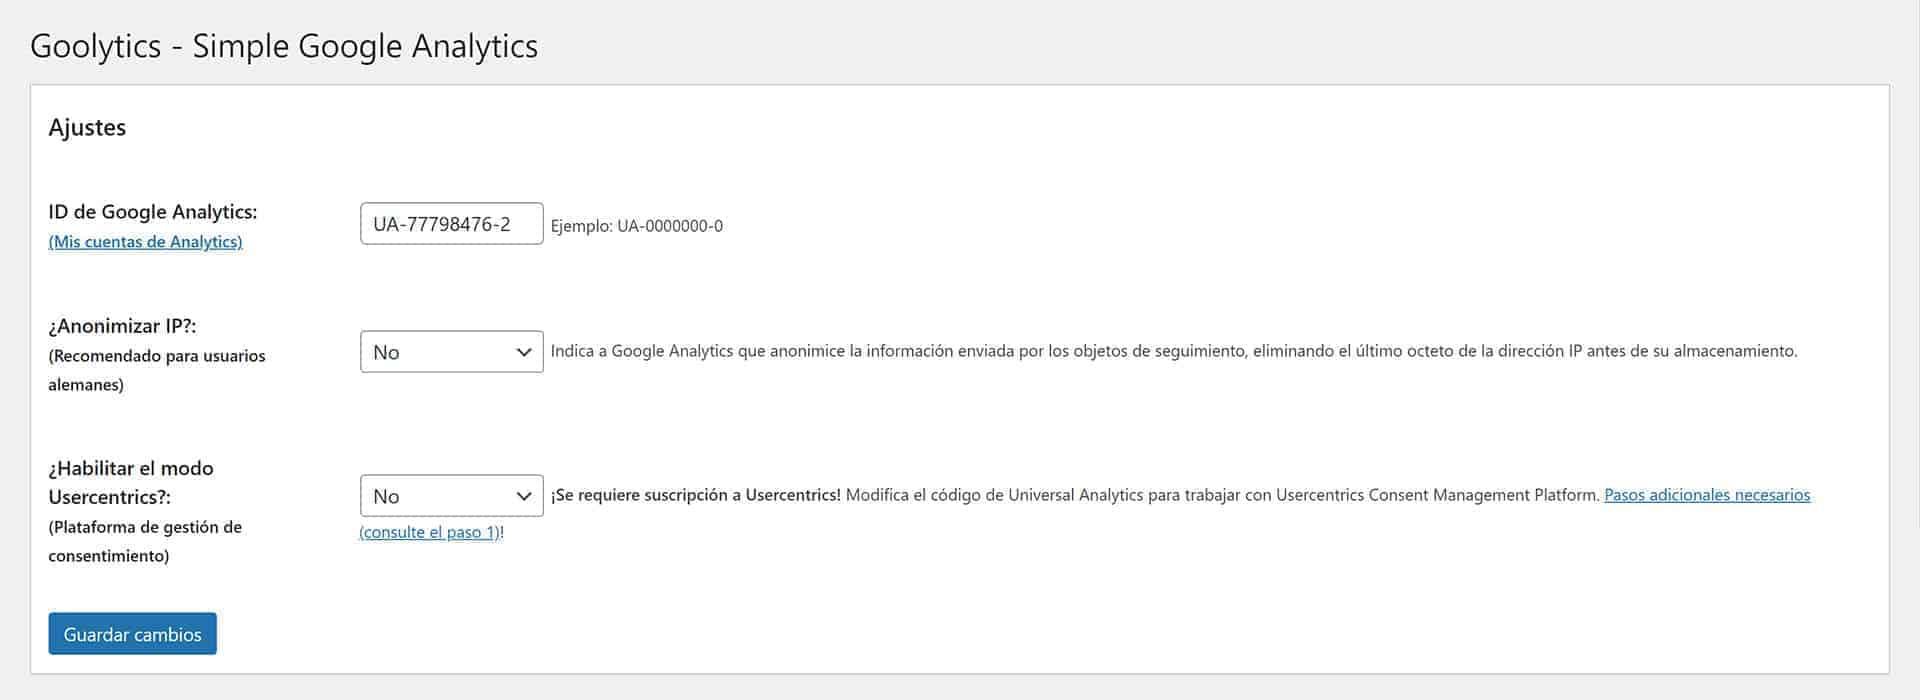 Ajustes de Simple Google Analytics.